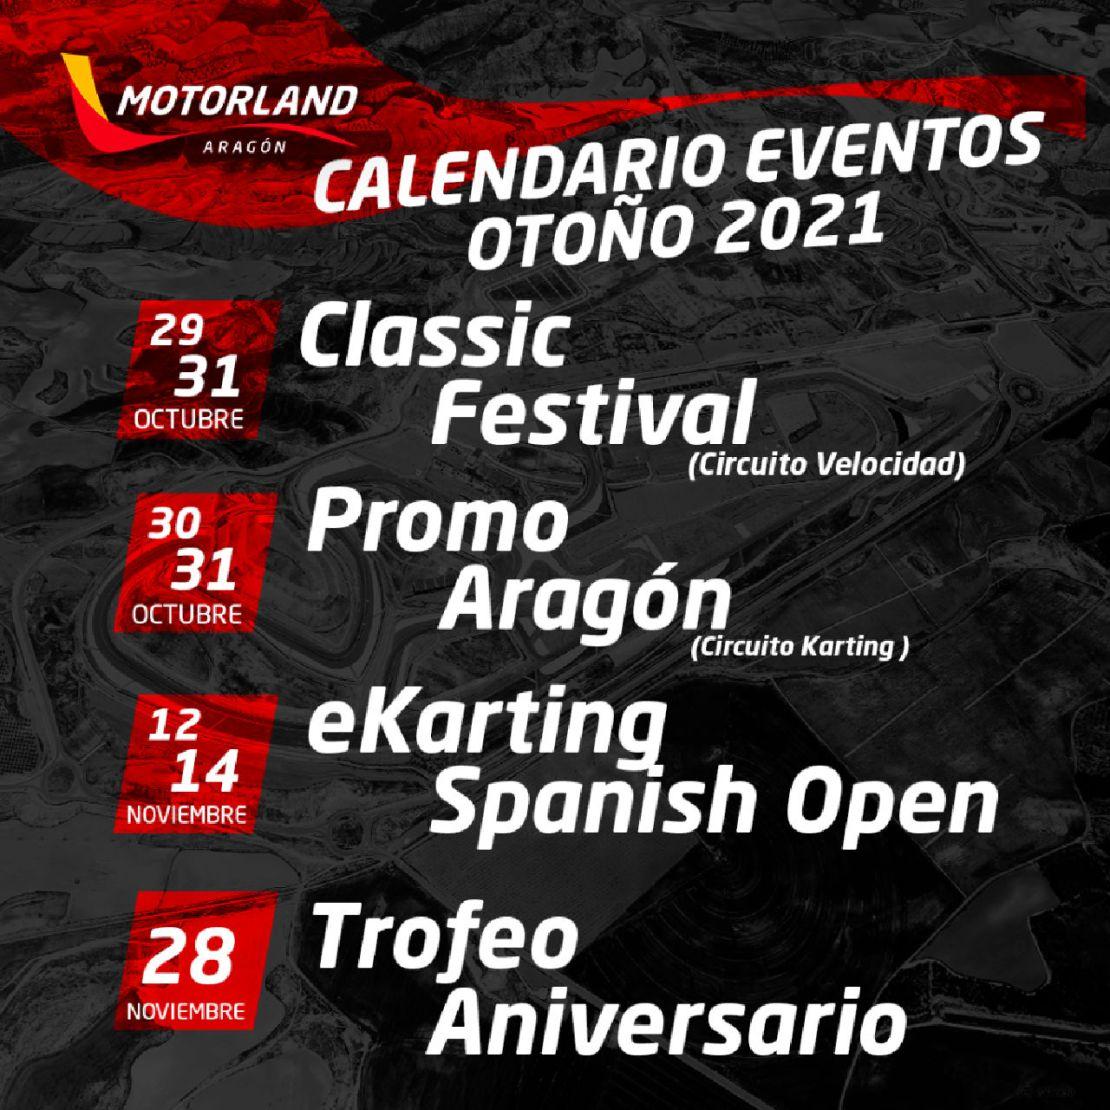 Calendario motorland